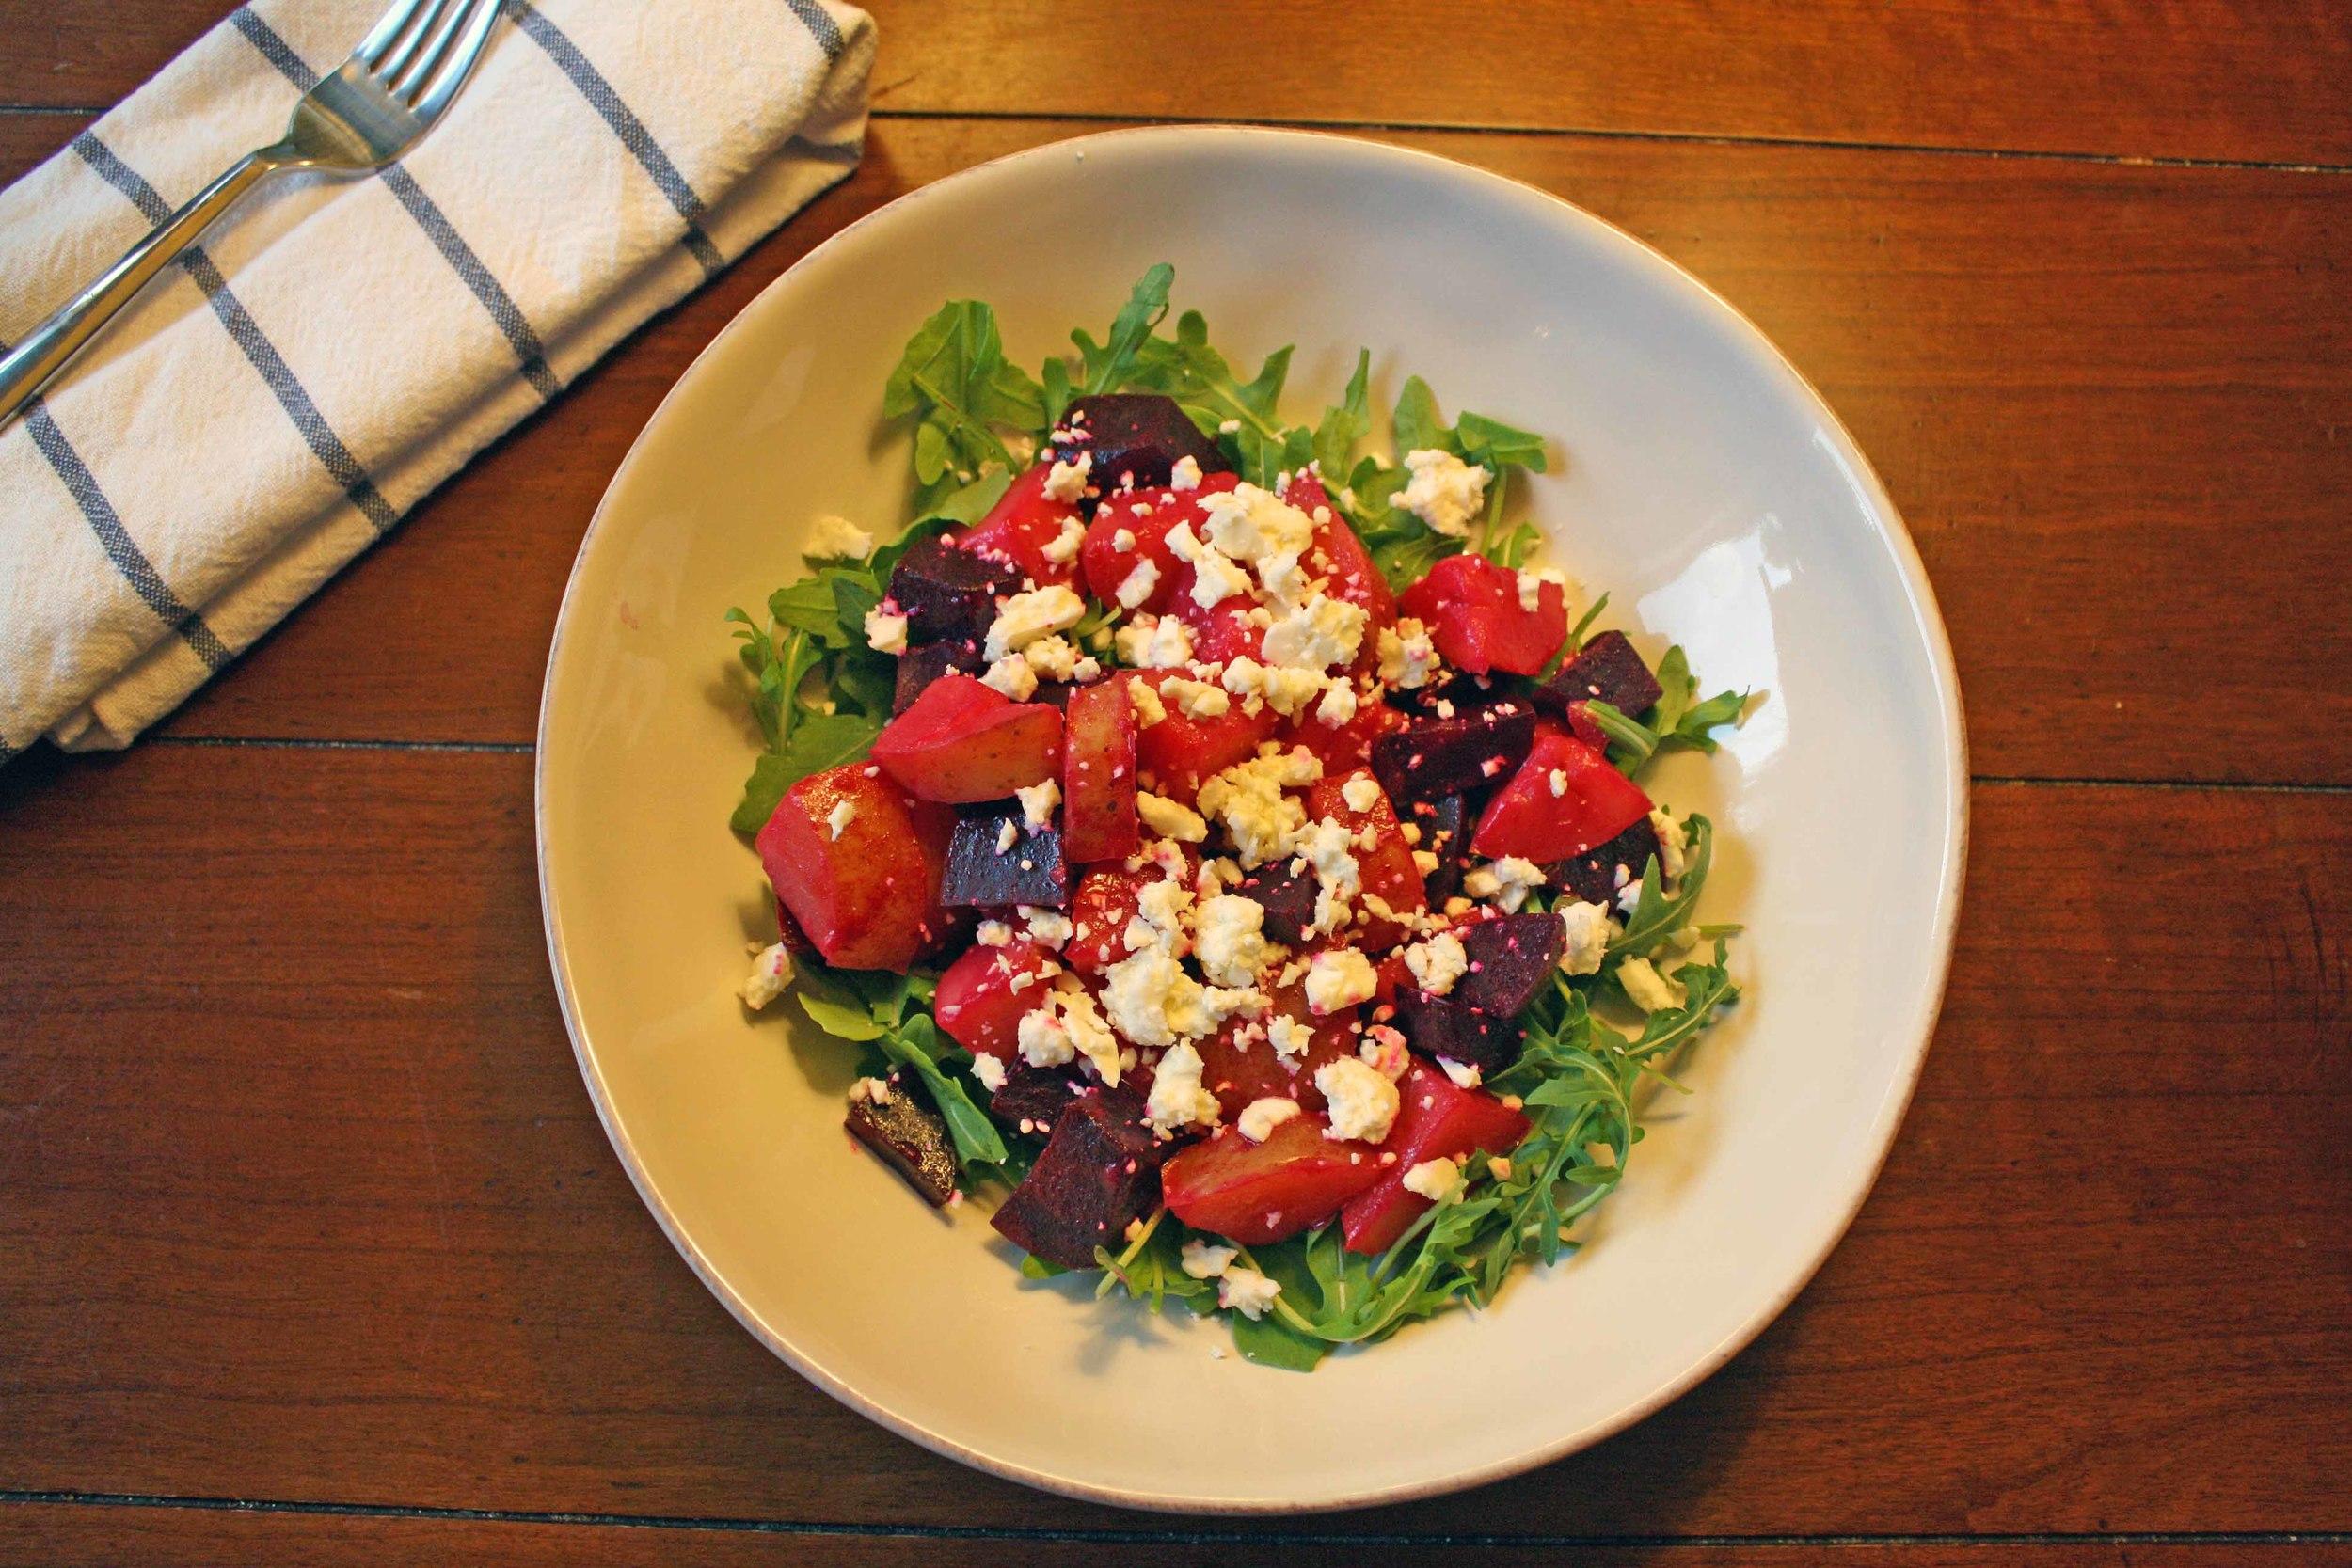 Roasted Beet and Arugula Salad. Photo by volunteer Kira Bennett Hamilton.